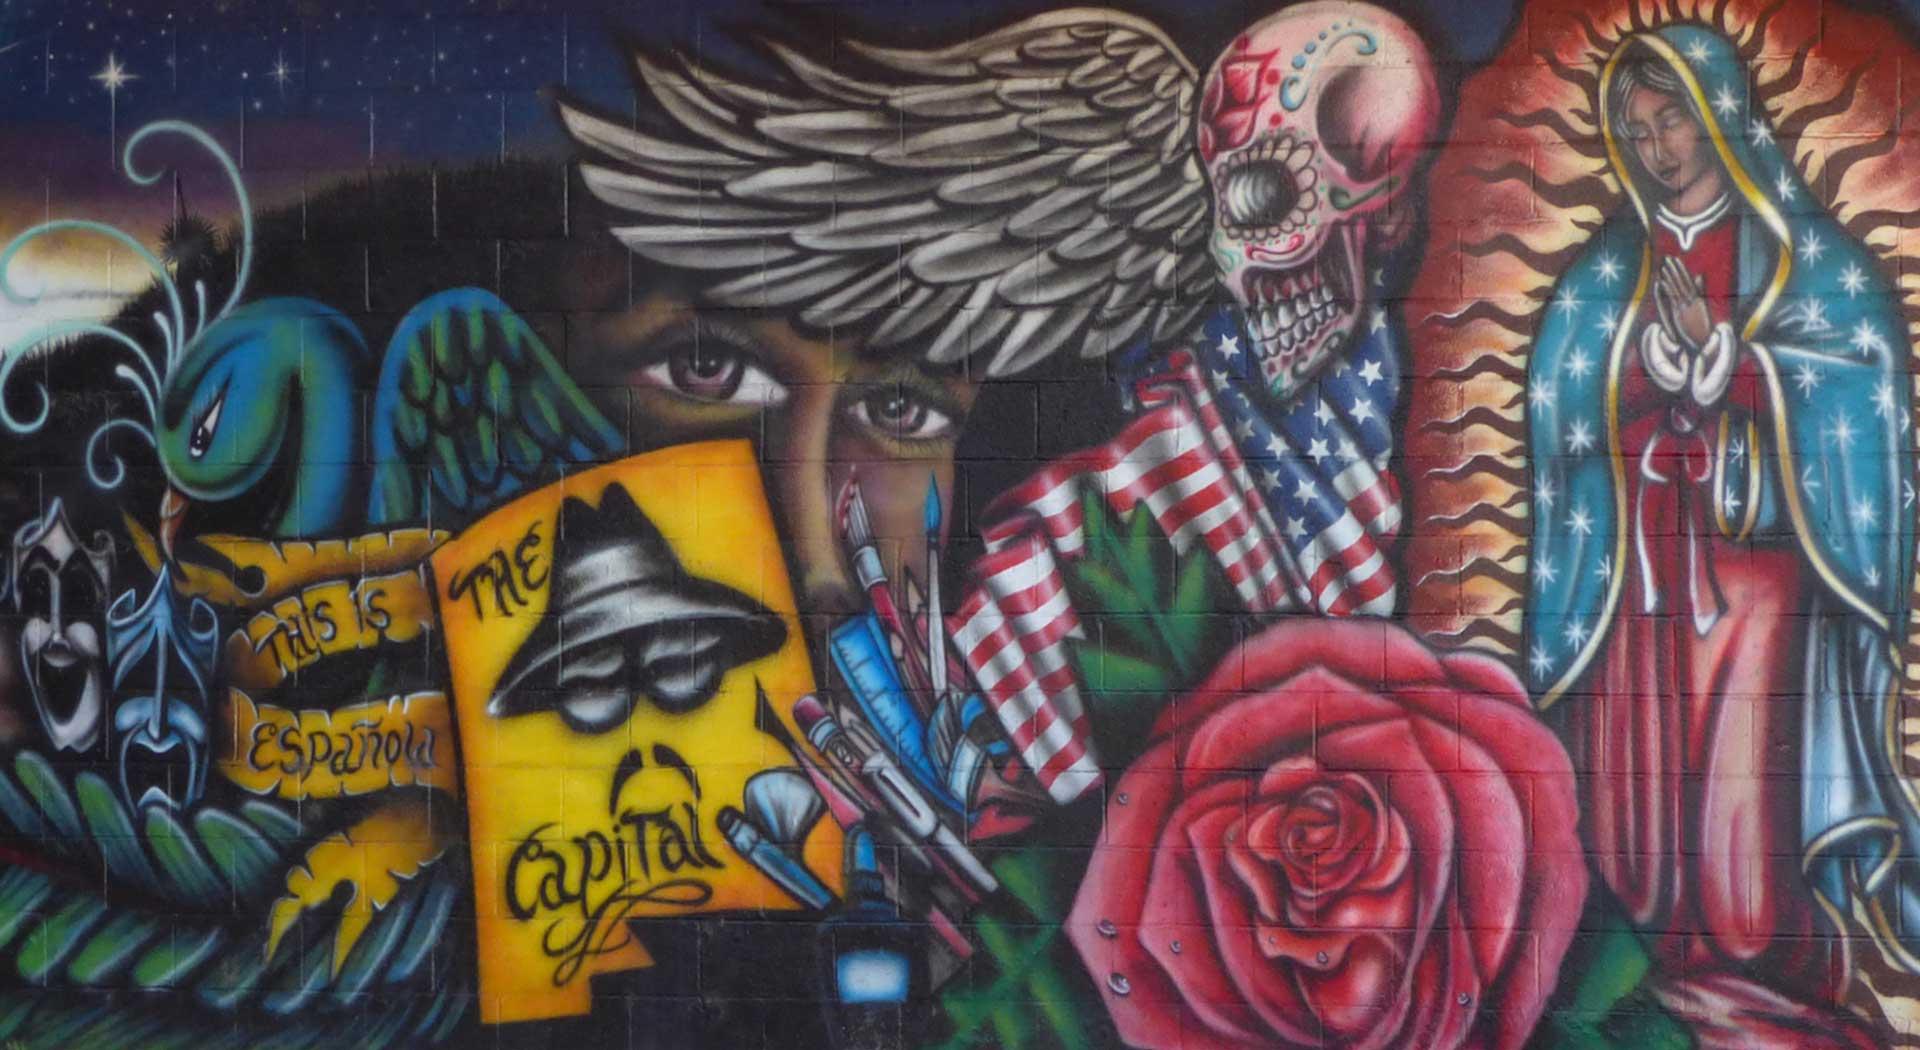 Espanola mural